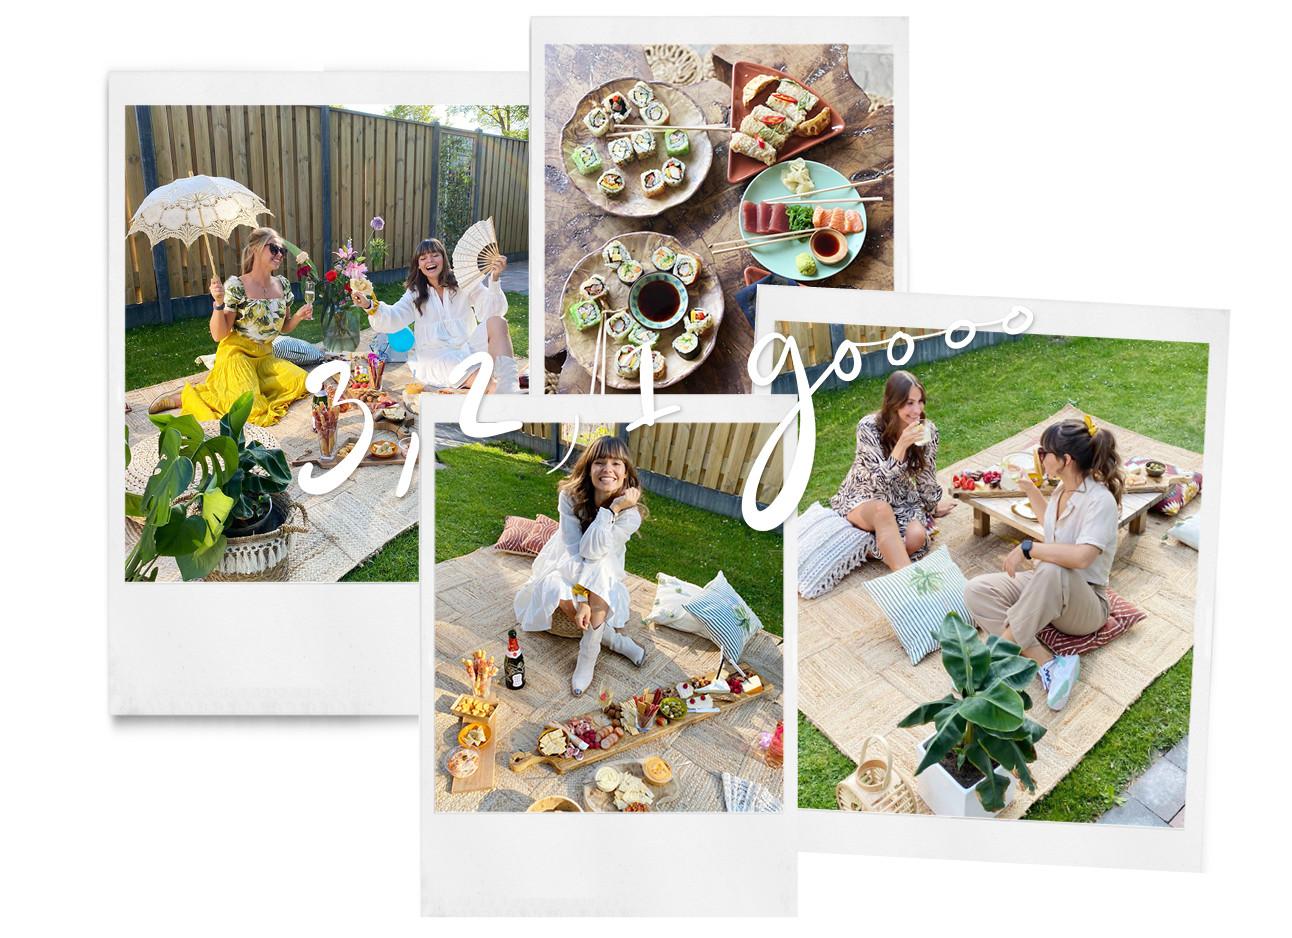 kiki lachend in haar tuin met een grote picknick kleed en houten plank lekkere hapjes